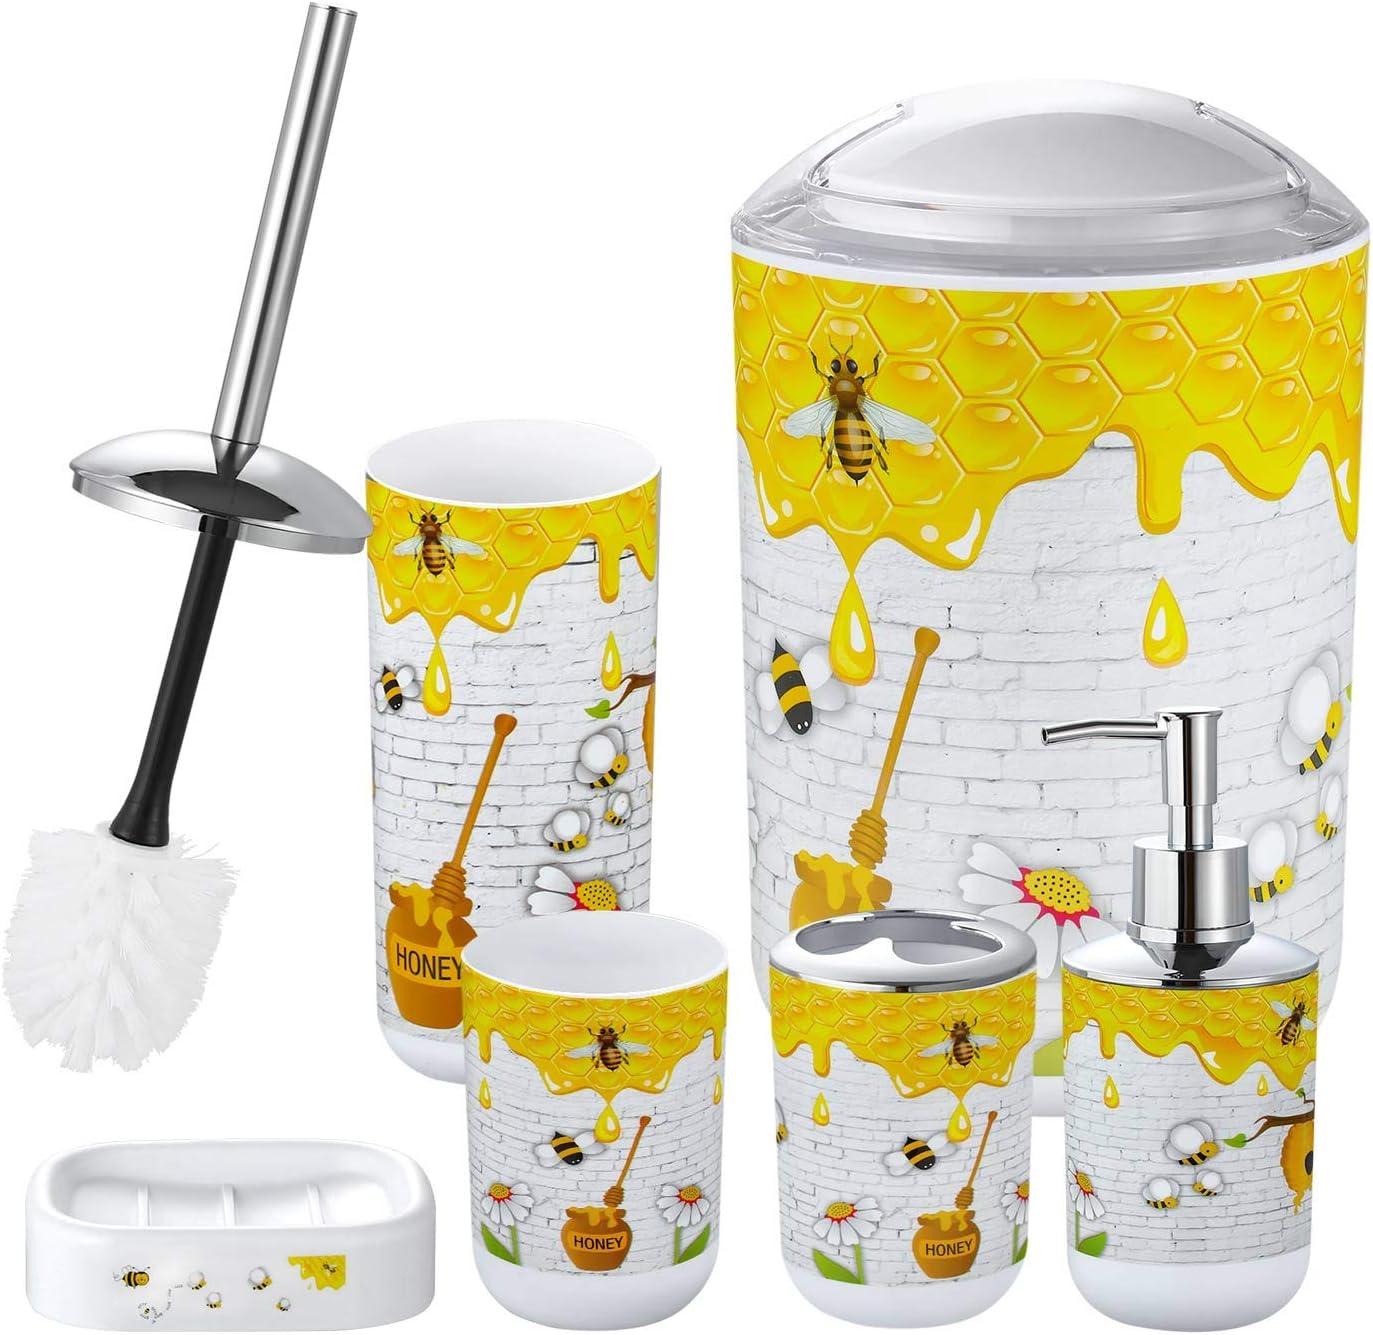 Toothbrush Cup Soap Dish Flat-Bottom Cup Straw Set Bathroom Soap Dispenser skonhed Bathroom Accessories Set Ocean 6-Piece Plastic Gift Set Toilet Brush Holder Toothbrush Holder Trash Can